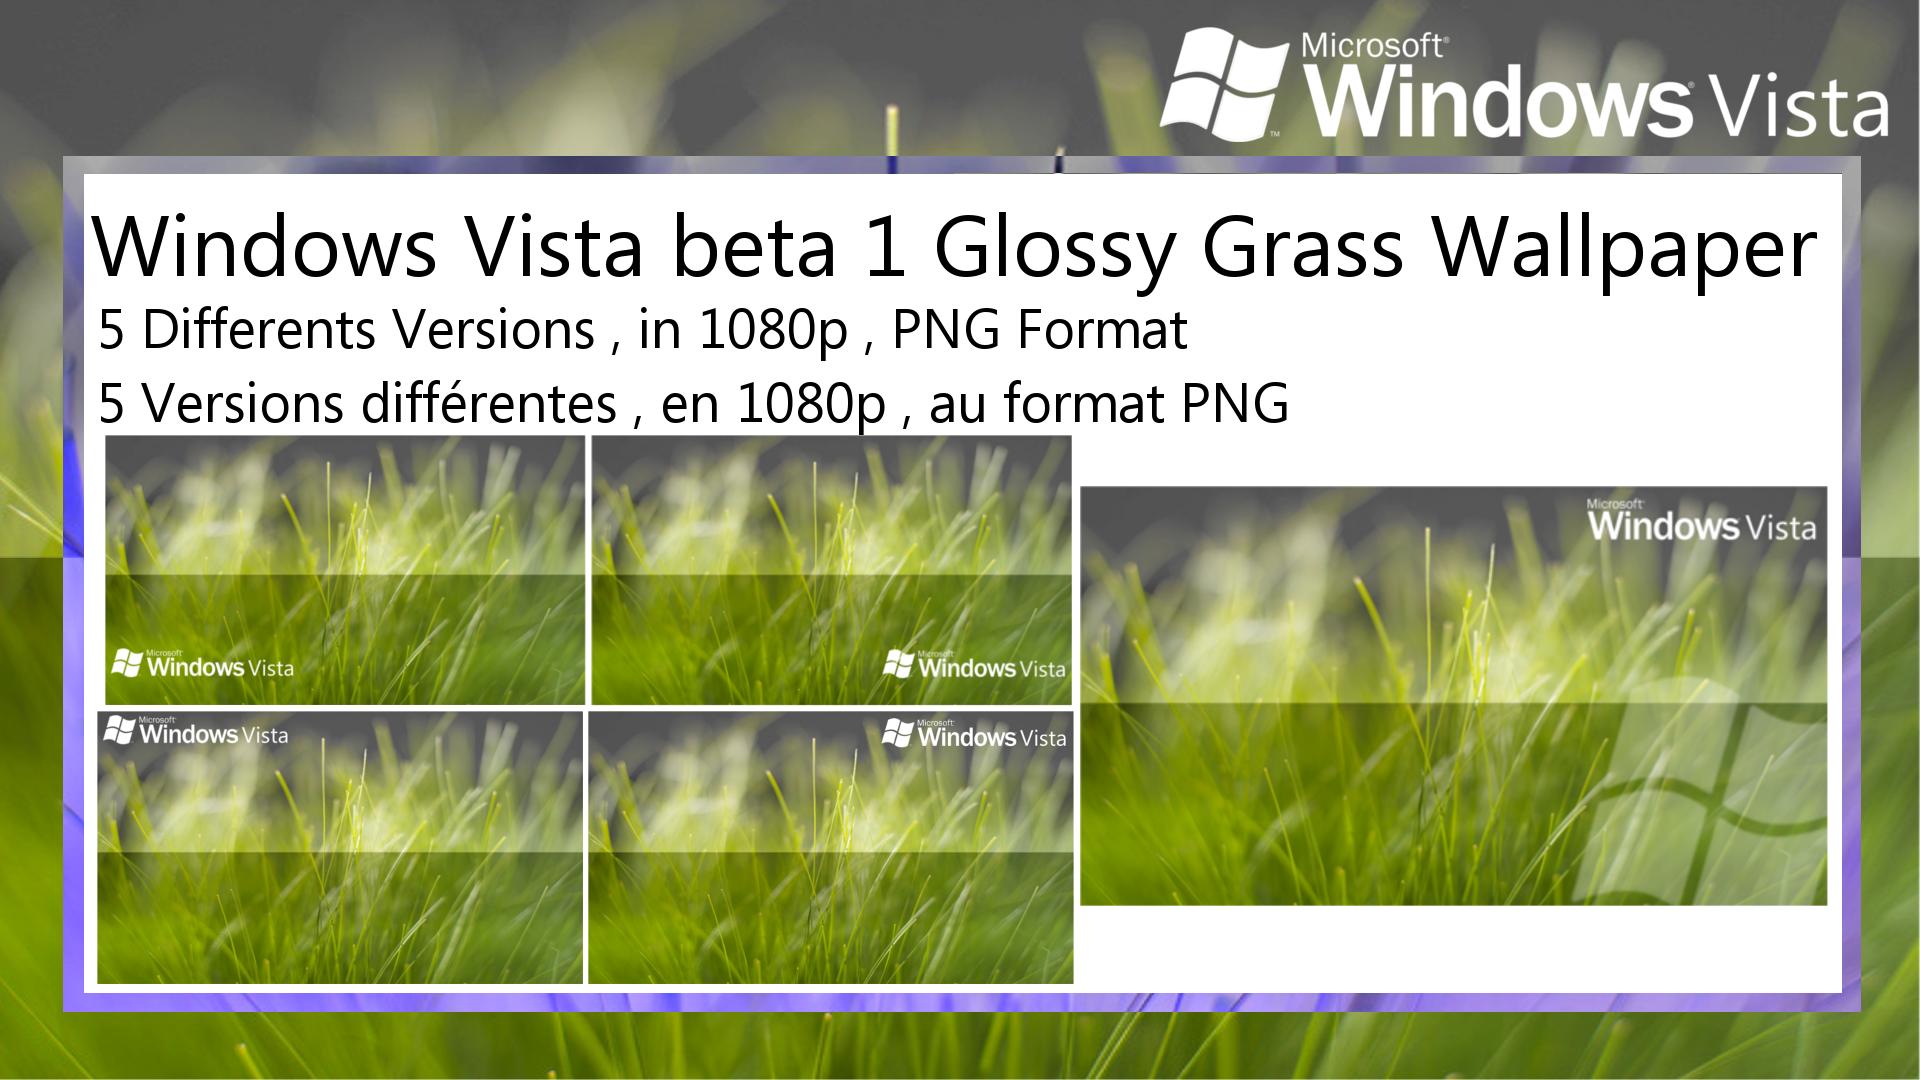 Windows Vista Beta 1 Glossy Grass Wallpaper Pack By Teknorider On